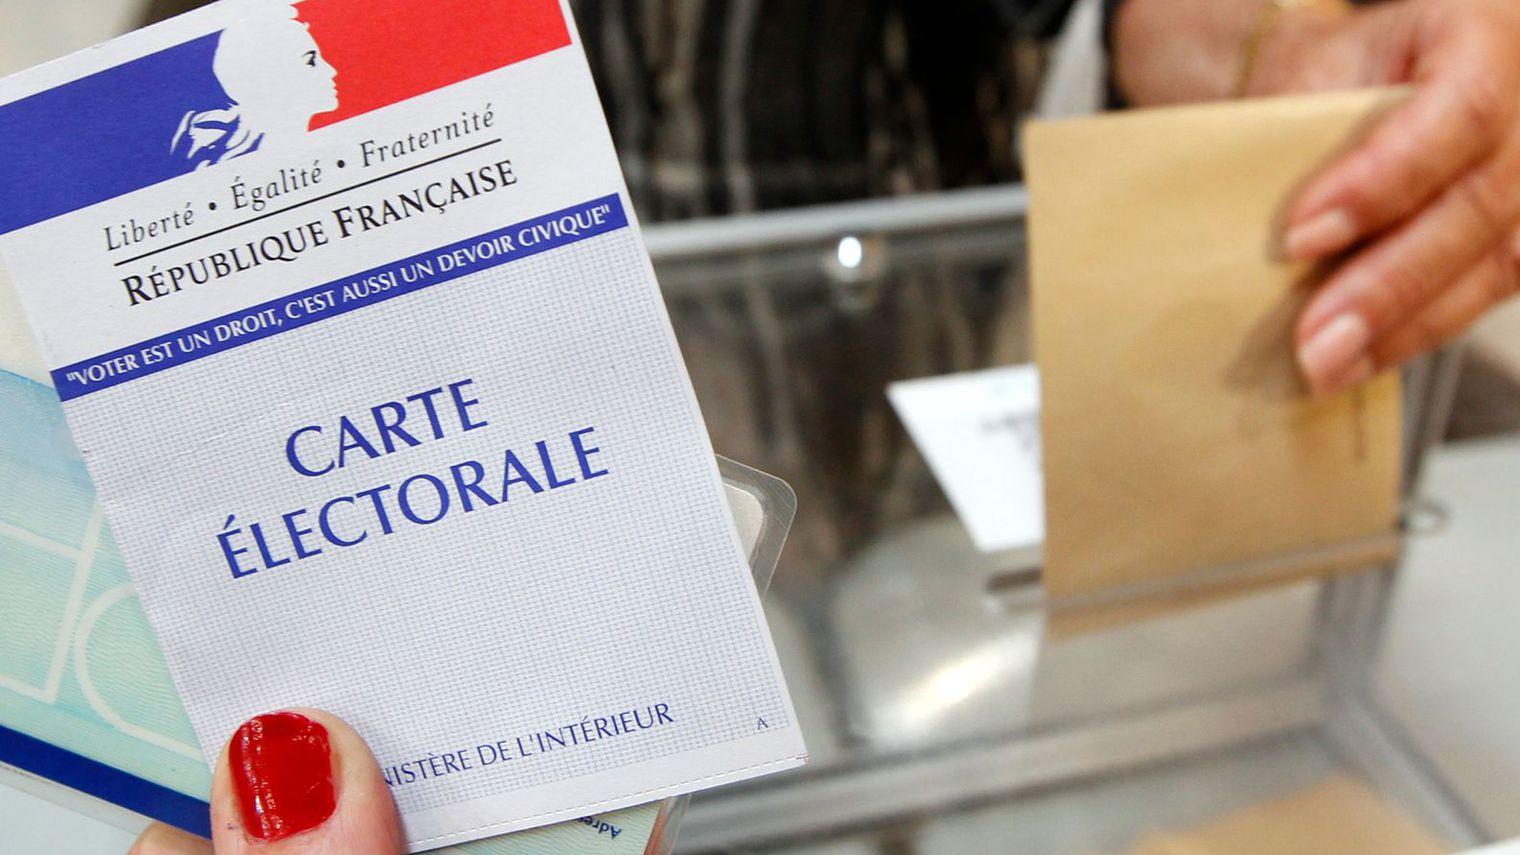 La scheda elettorale francese